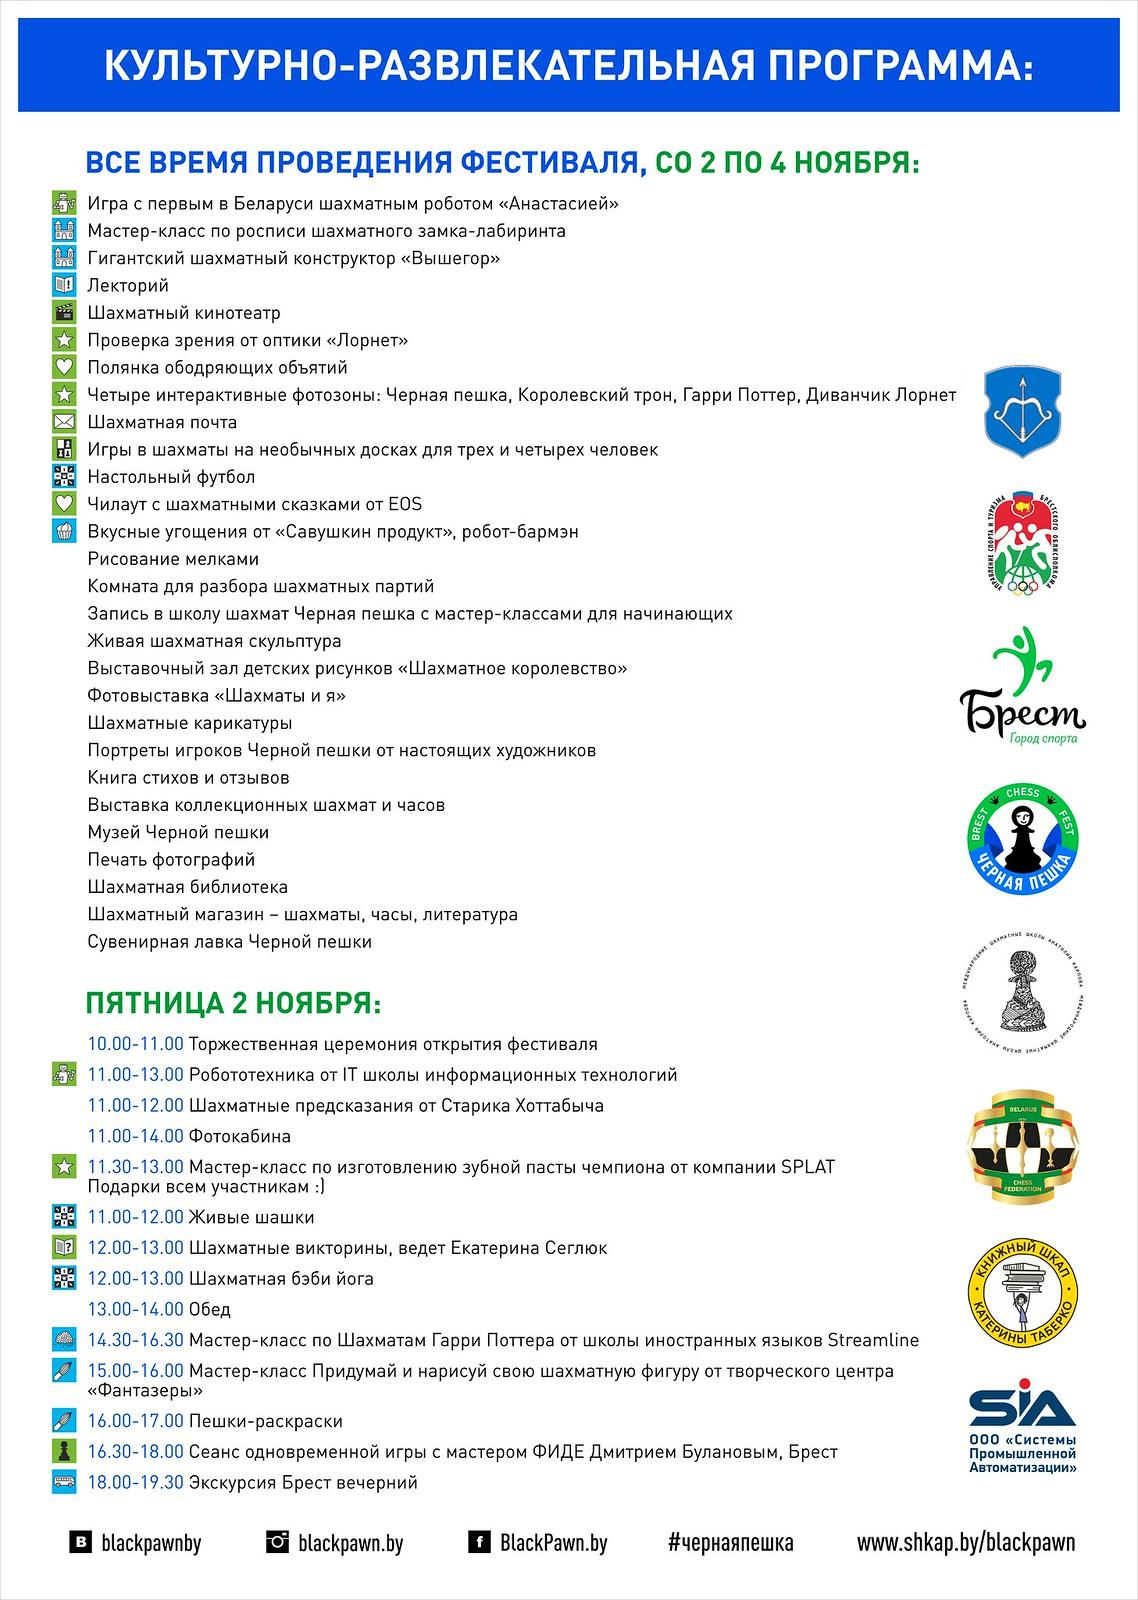 Программа МАСТЕР КЛАССОВ 32х45_бумага170_2в листа по 15шт